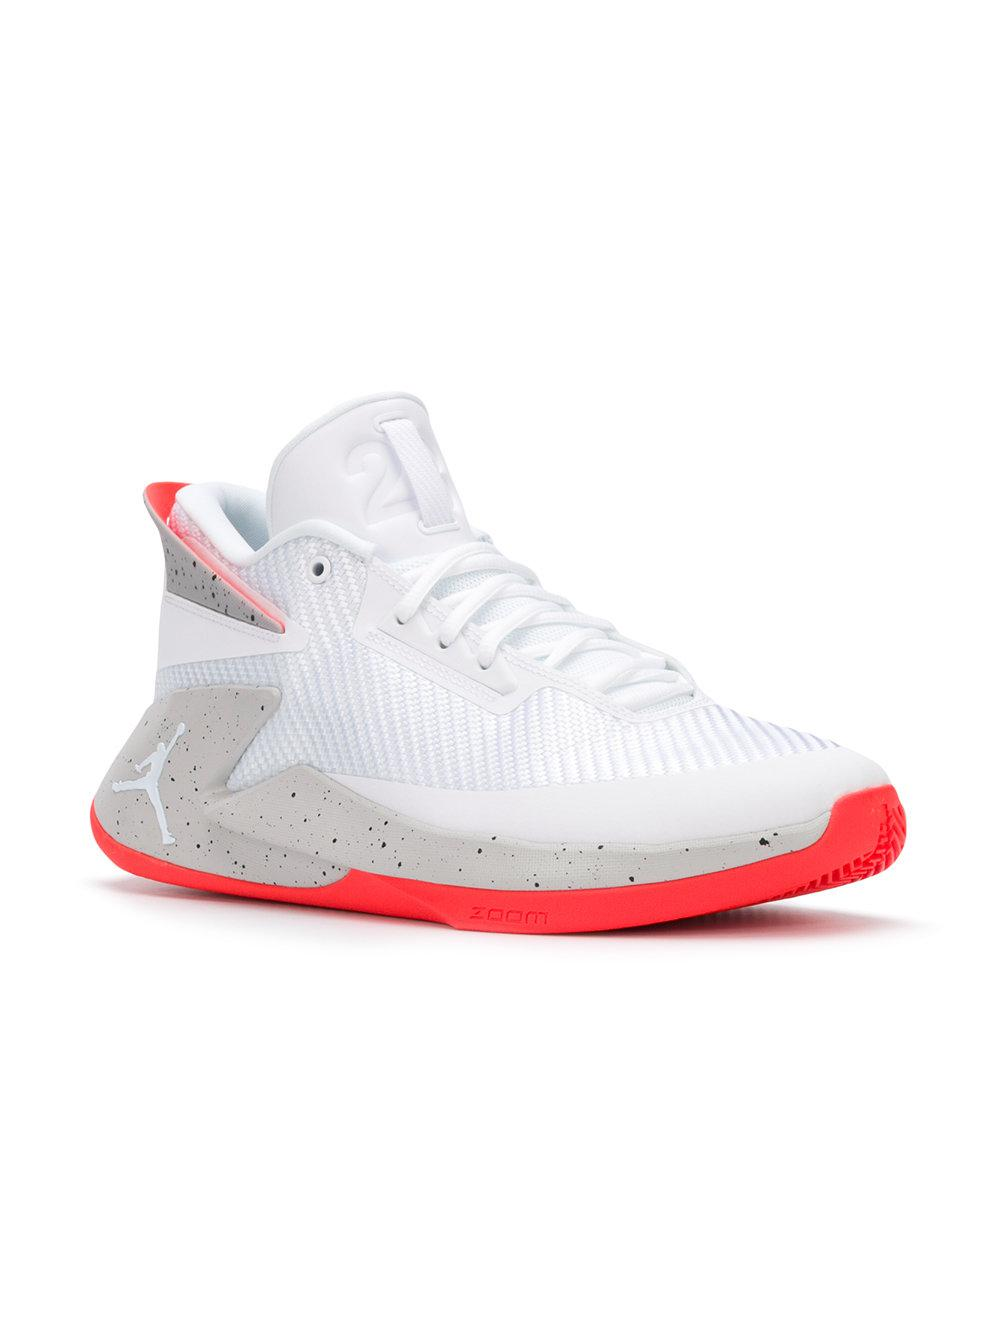 c0b6d3c8a1c Nike Jordan Fly Lockdown Trainers in White for Men - Lyst